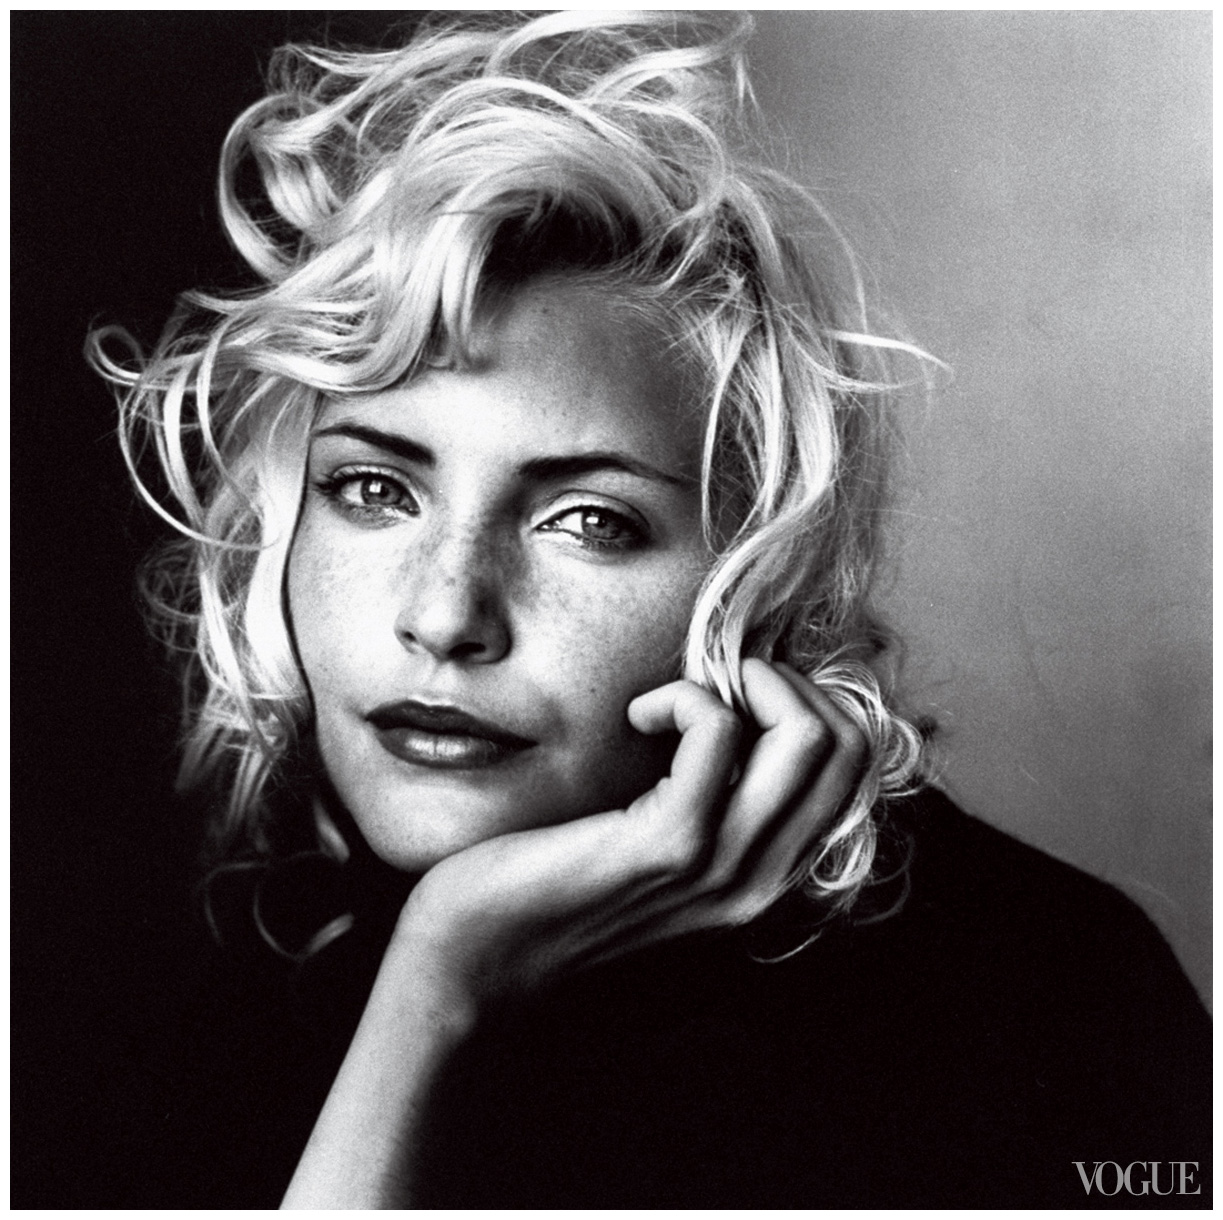 Irving penn famous fashion and beauty portrait photographer